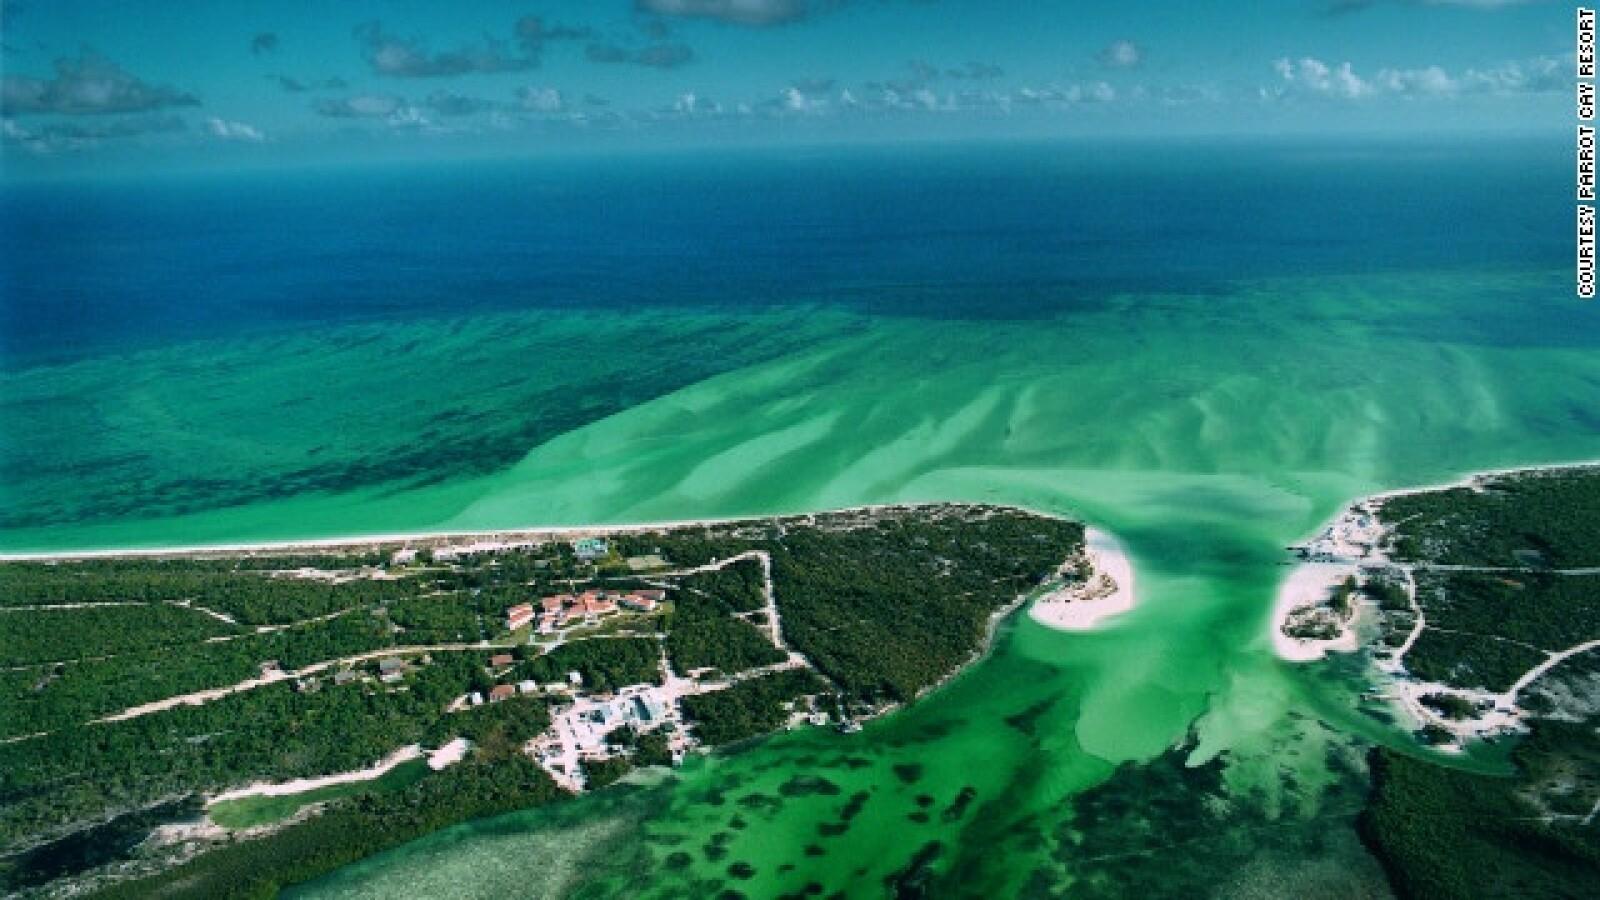 Parrot Cay Resort, Turks & Caicos Islands